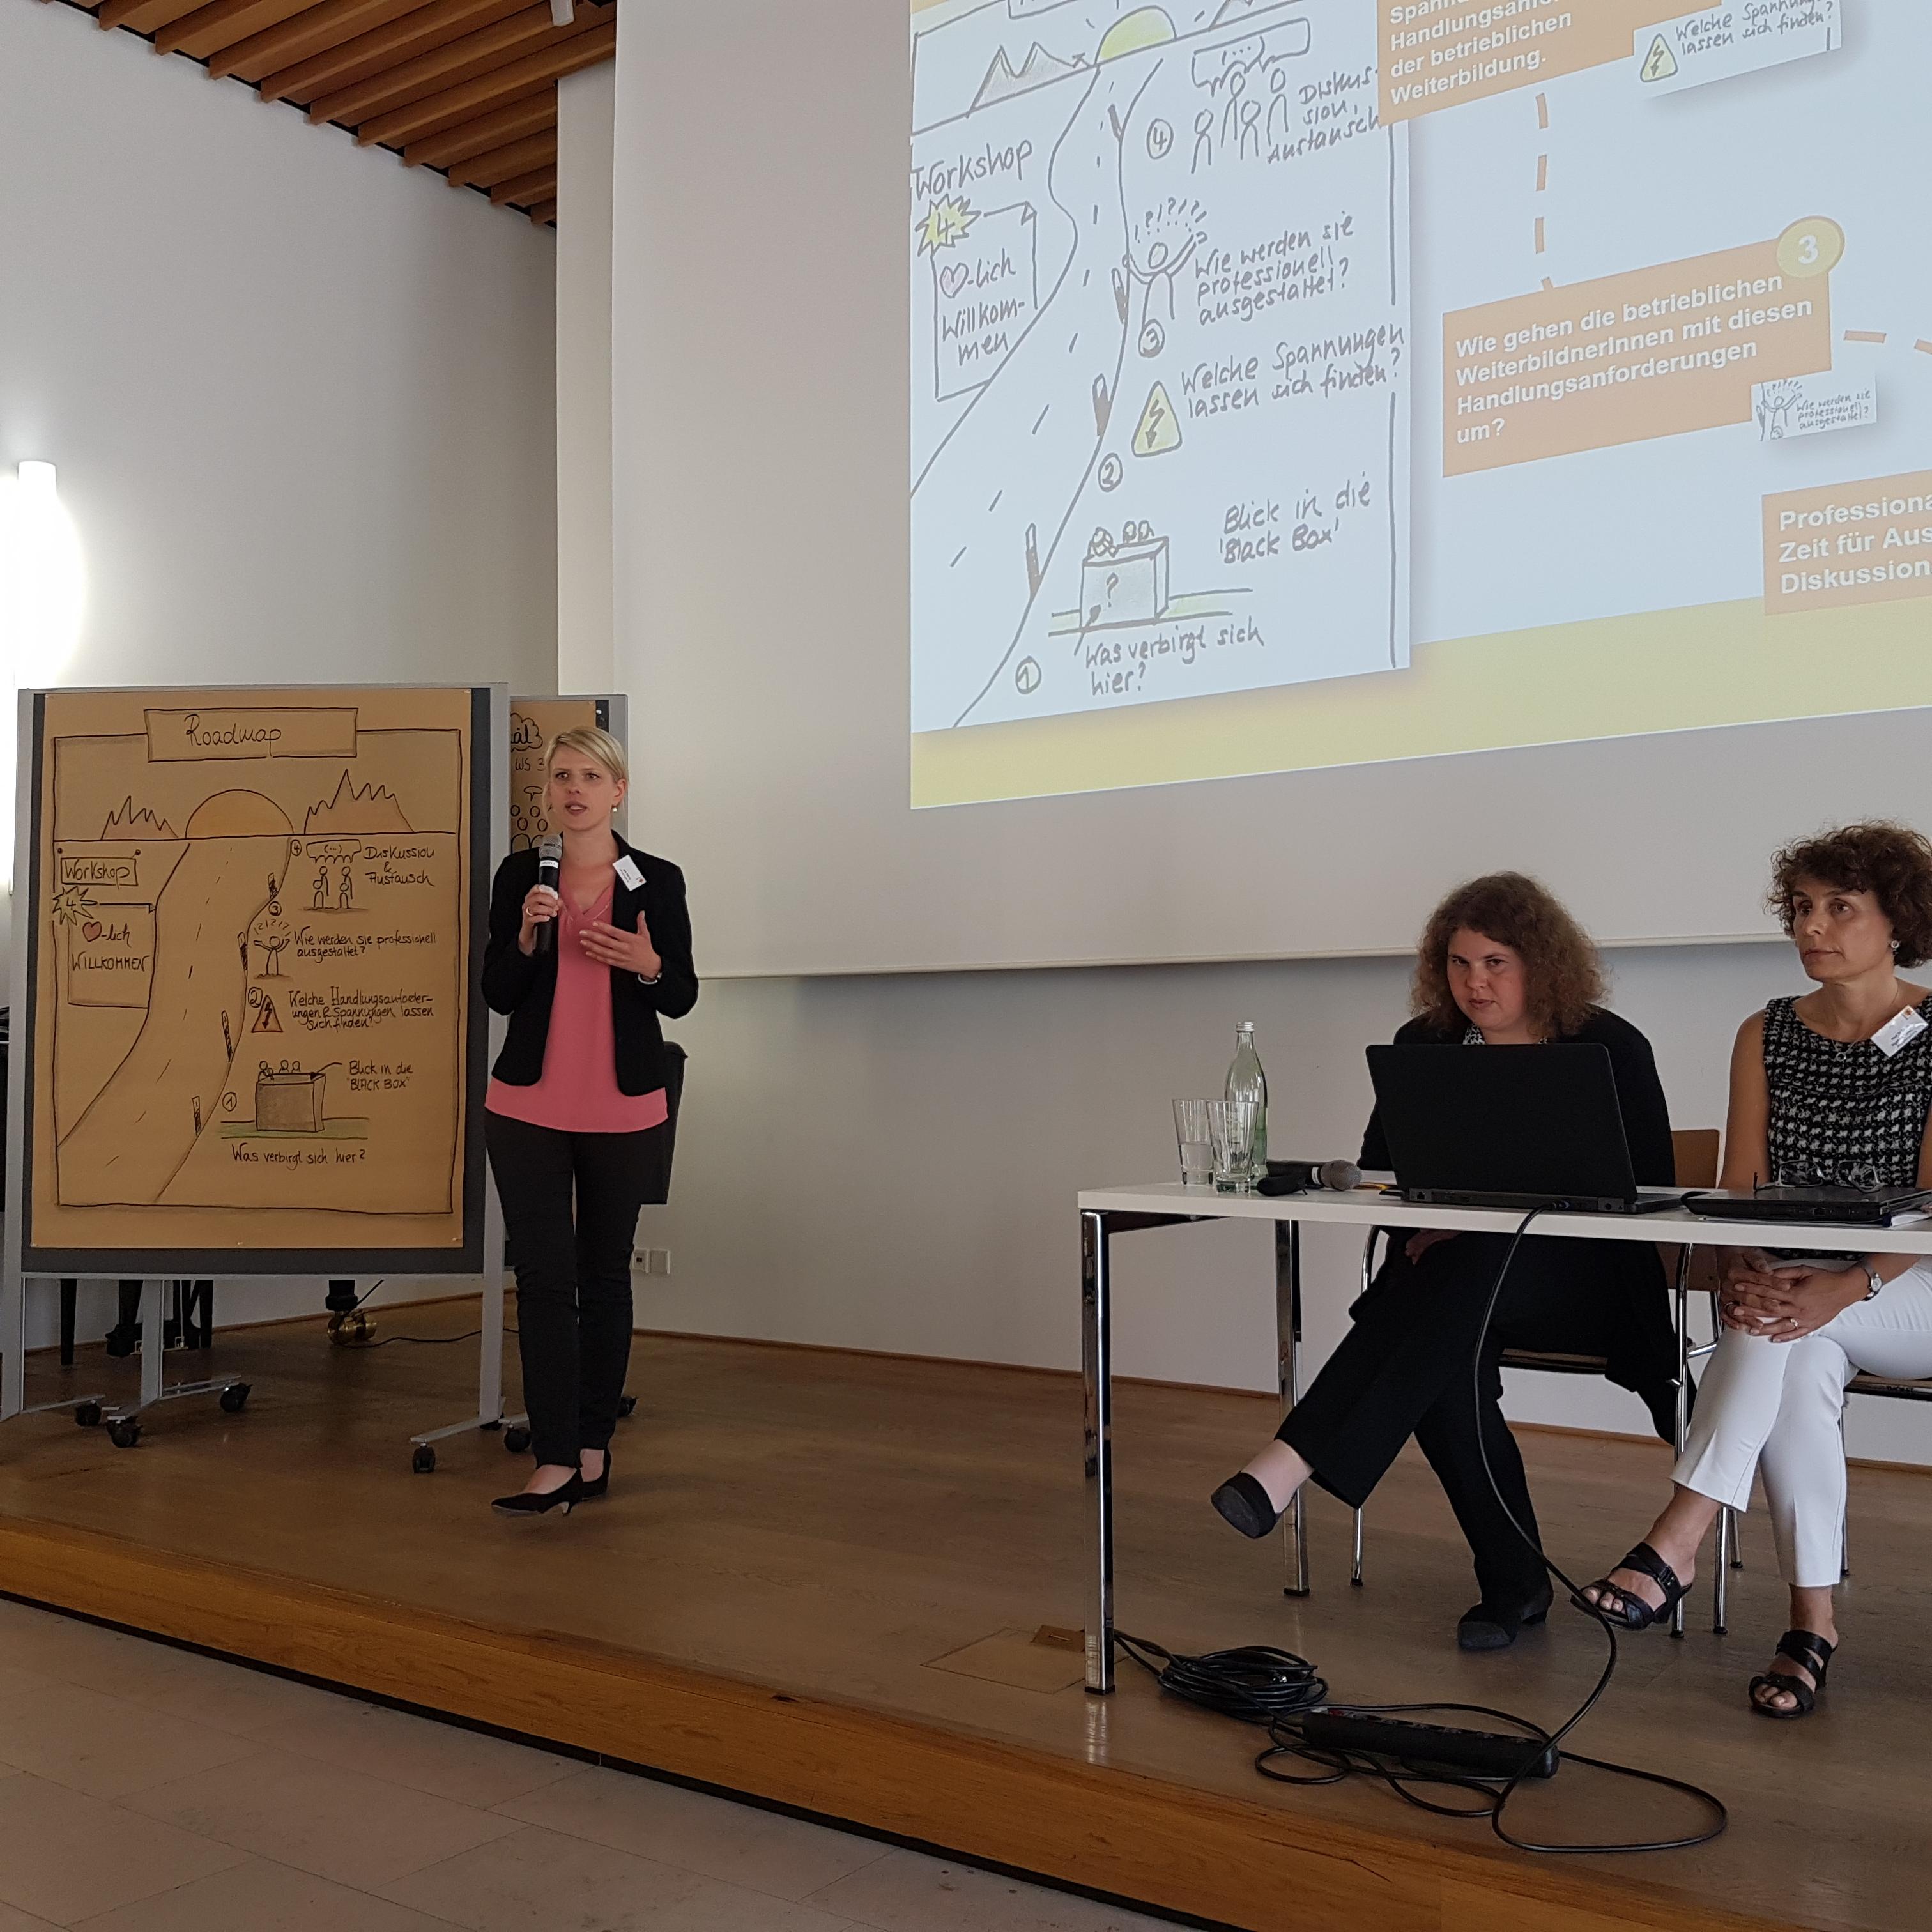 Julia Nährig präsentiert Workshop IV (r. im Bild: I.Schüßler, R. Egentenmeyer)